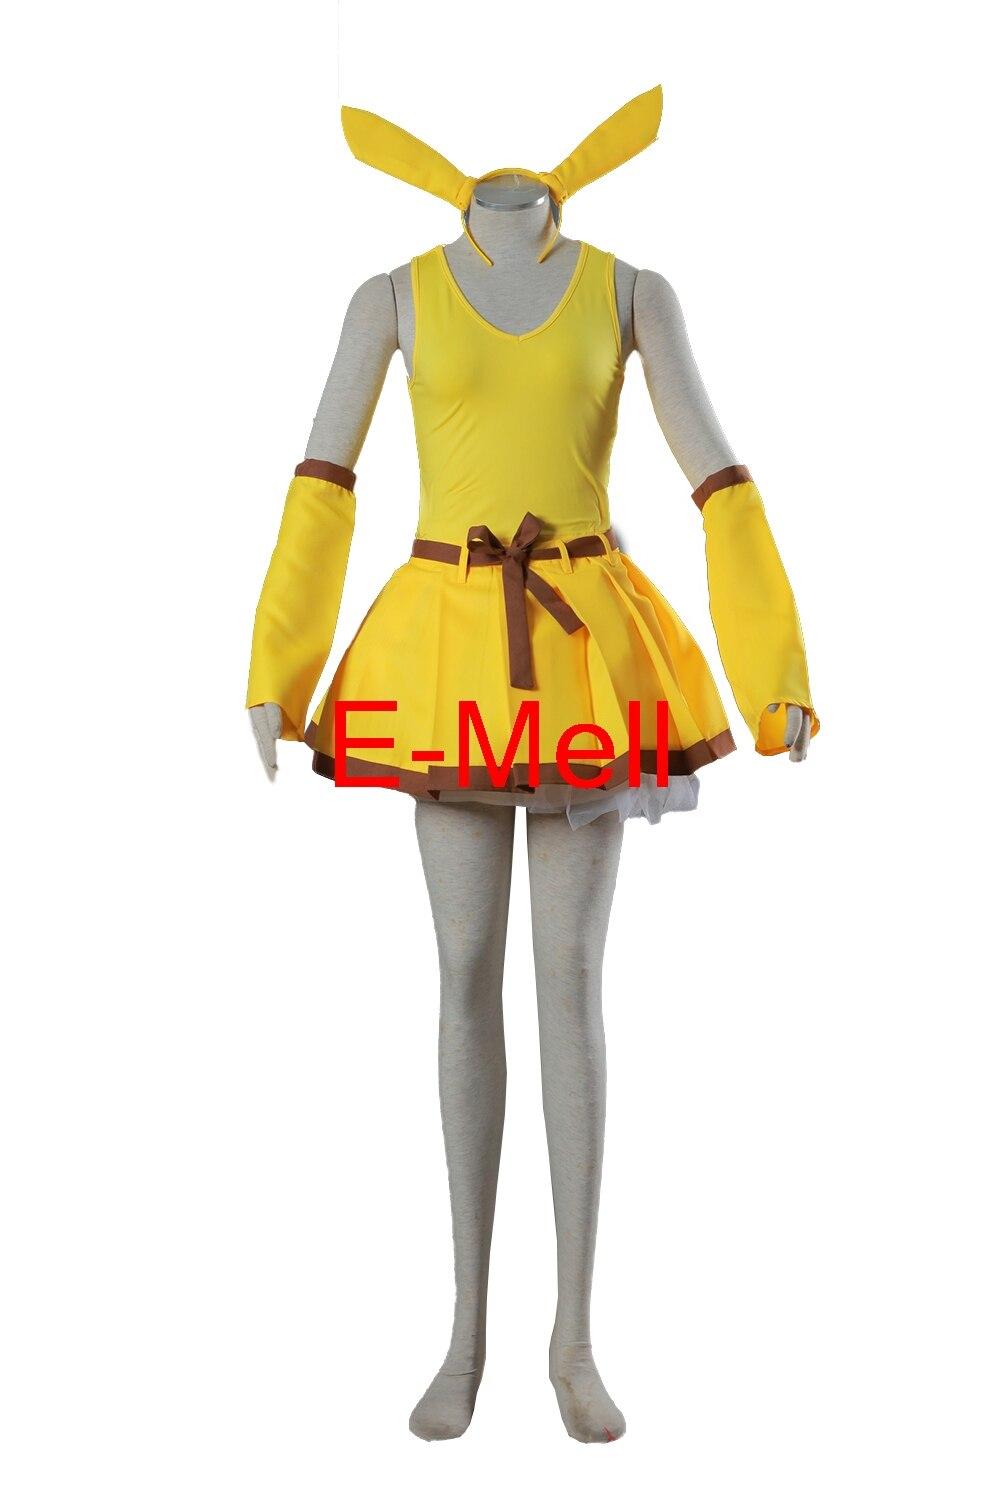 brdwn cosplay pikachu raichu costume halloween costumes women full set uniform suitchina - Pikachu Halloween Costume Women